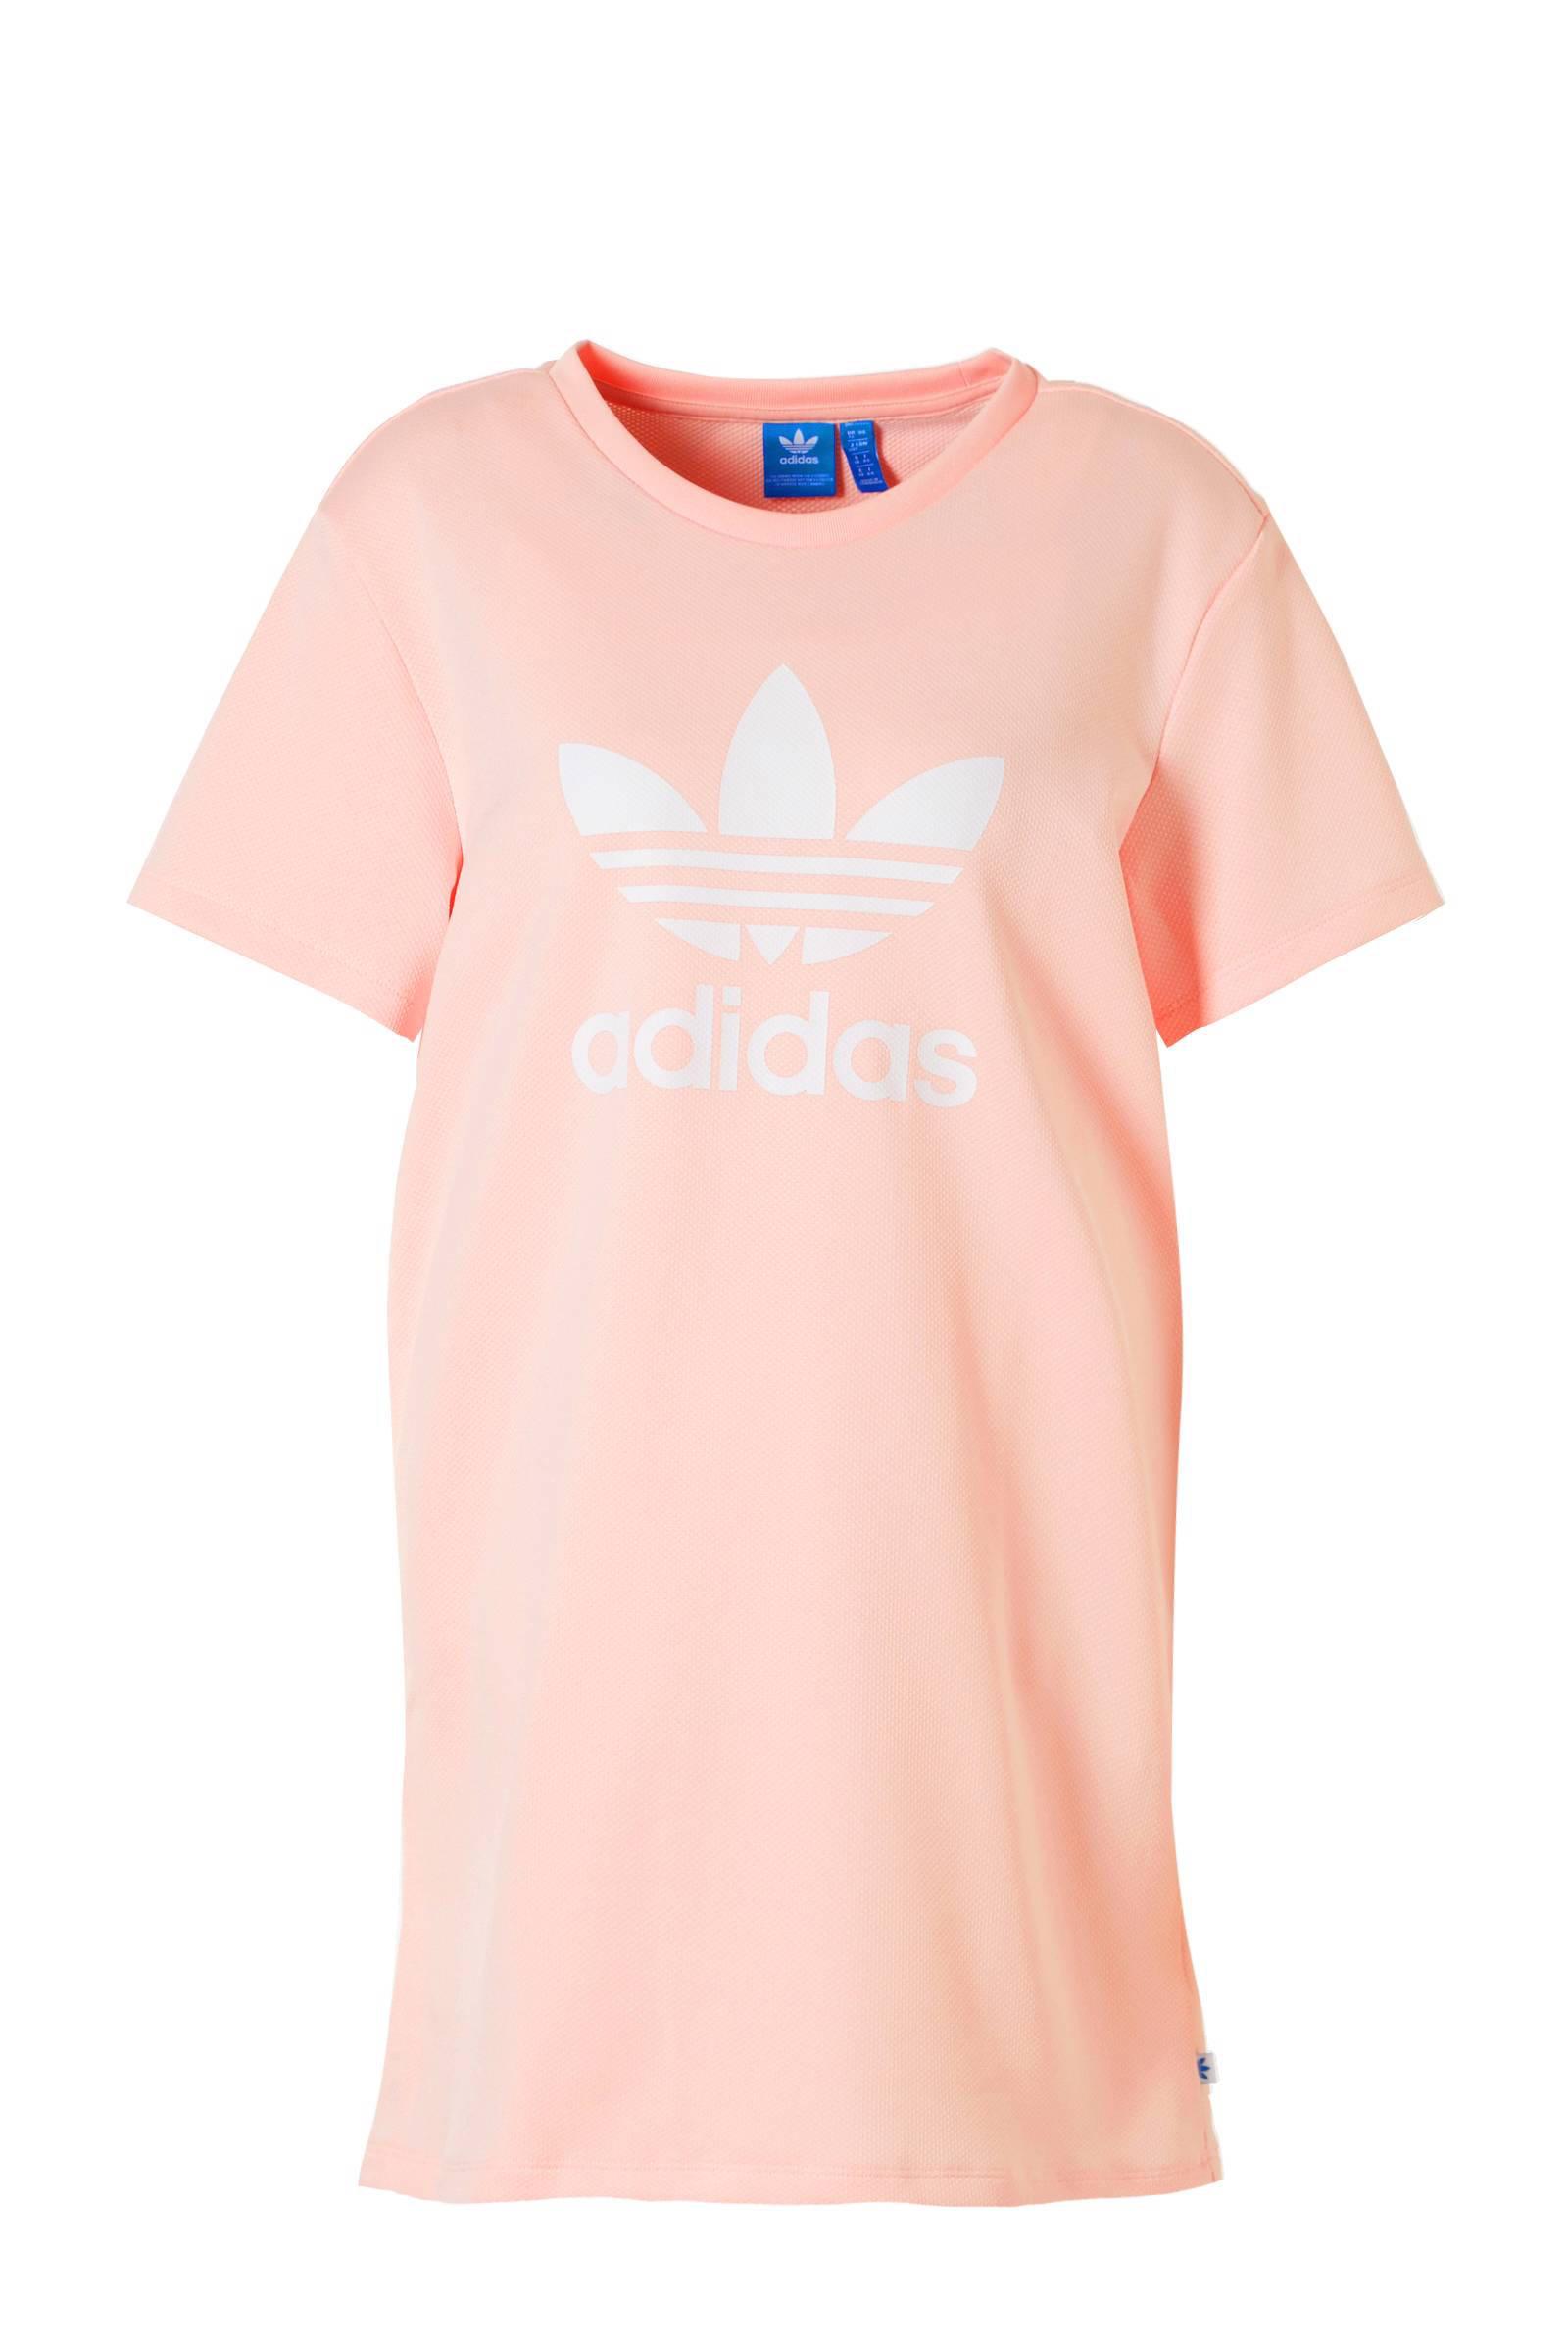 adidas Originals T-shirtjurk